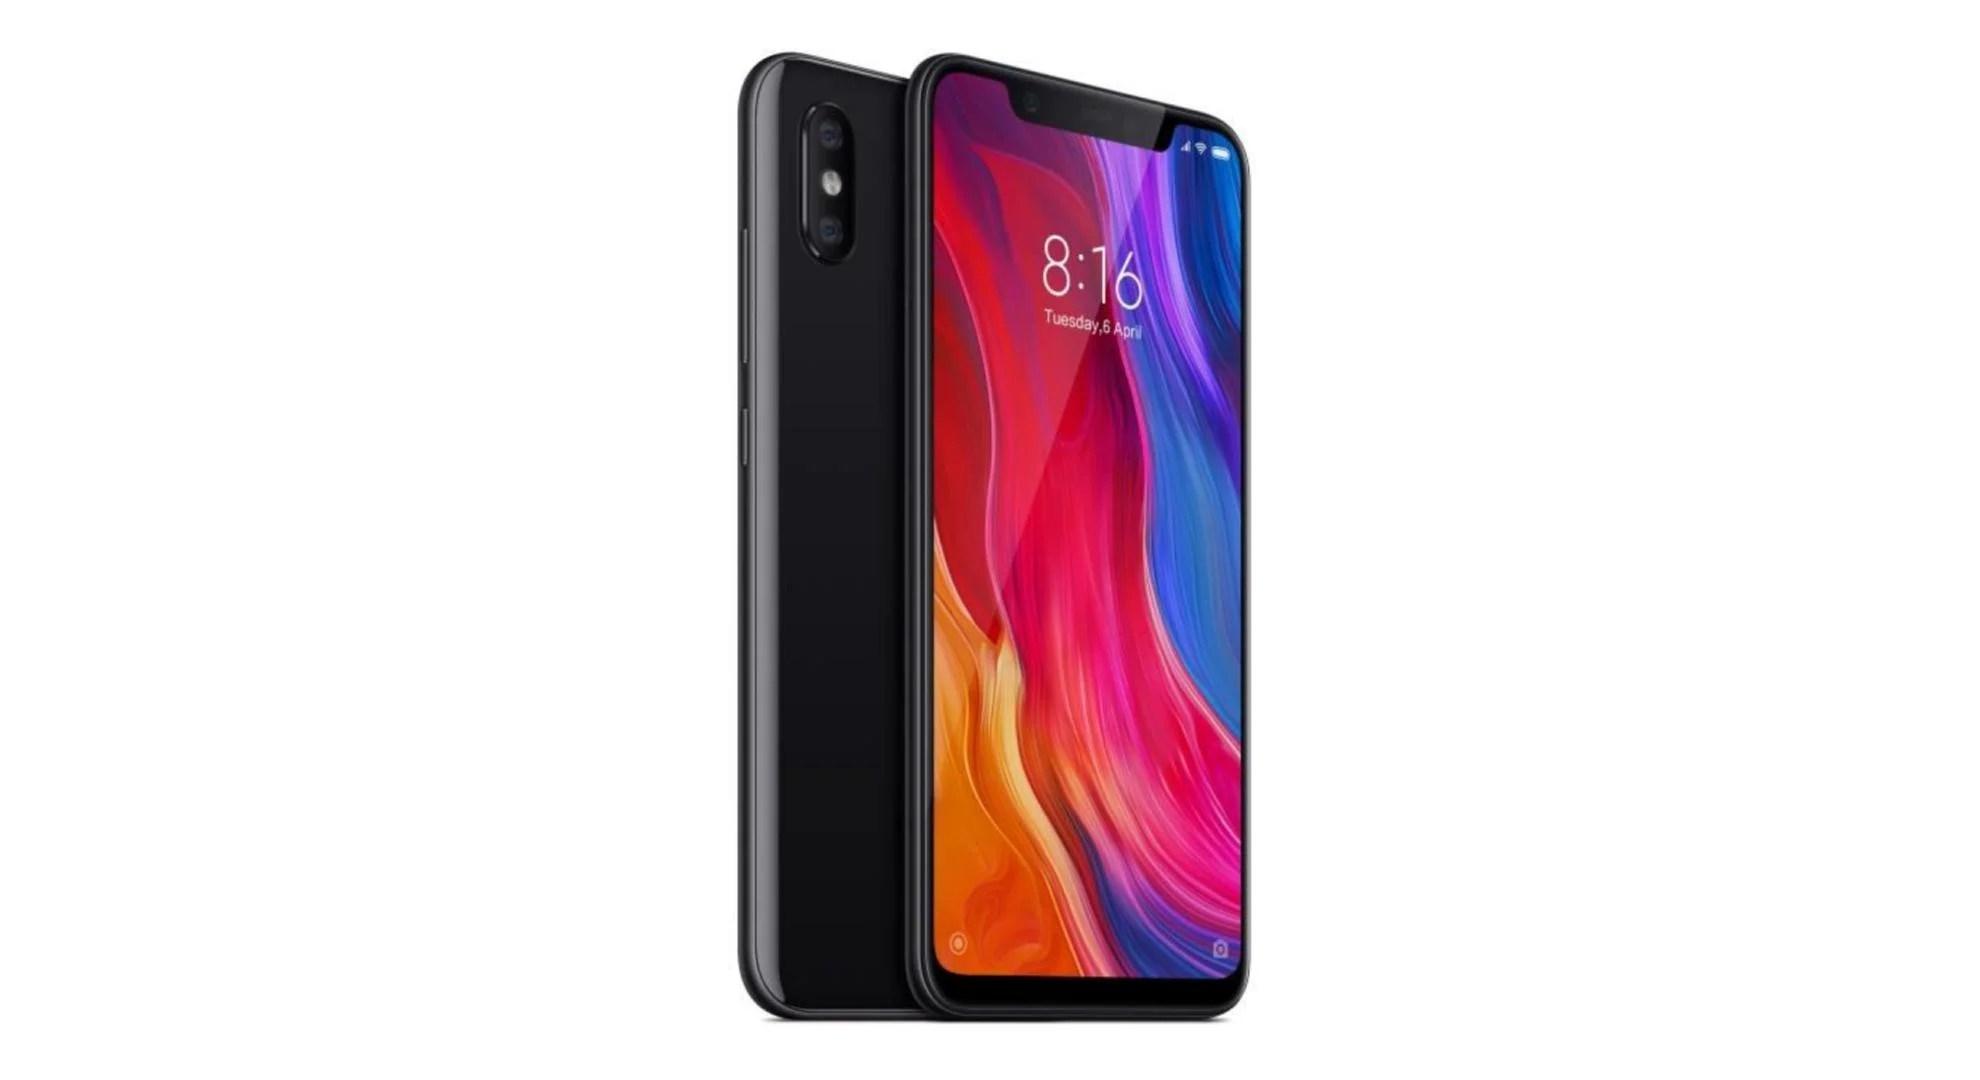 🔥 Bon plan : le Xiaomi Mi 8 passe sous la barre des 300 euros